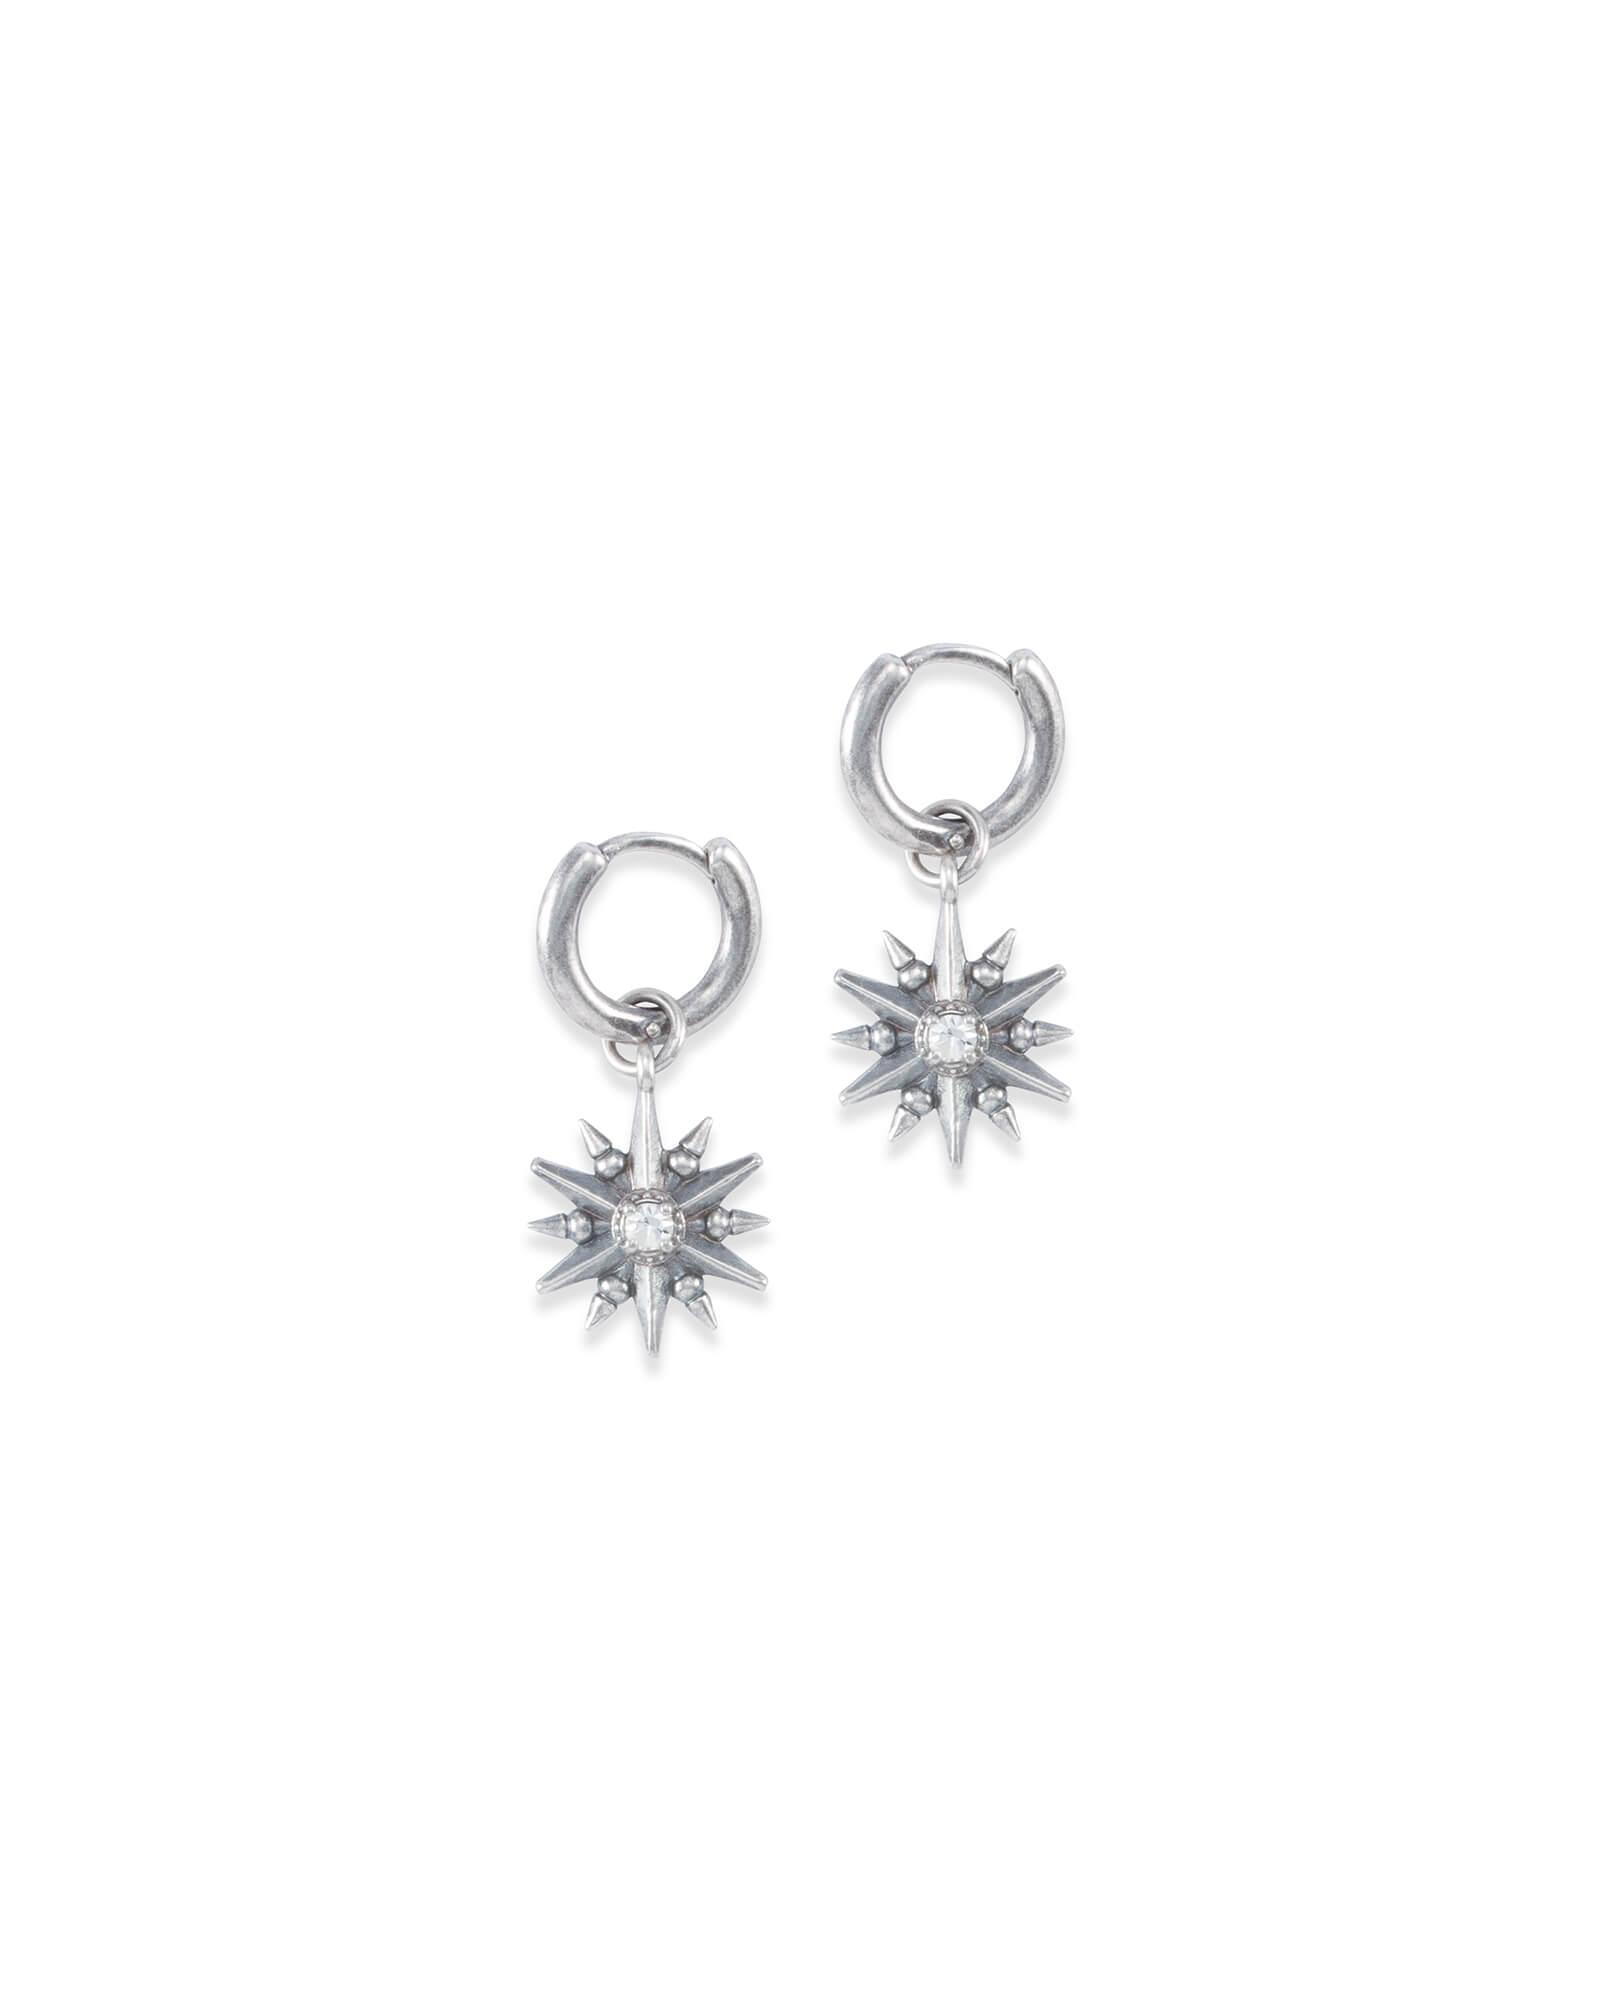 a8fb290f1 Starburst Charm Earrings Set, Kendra Scott, $60, shop now